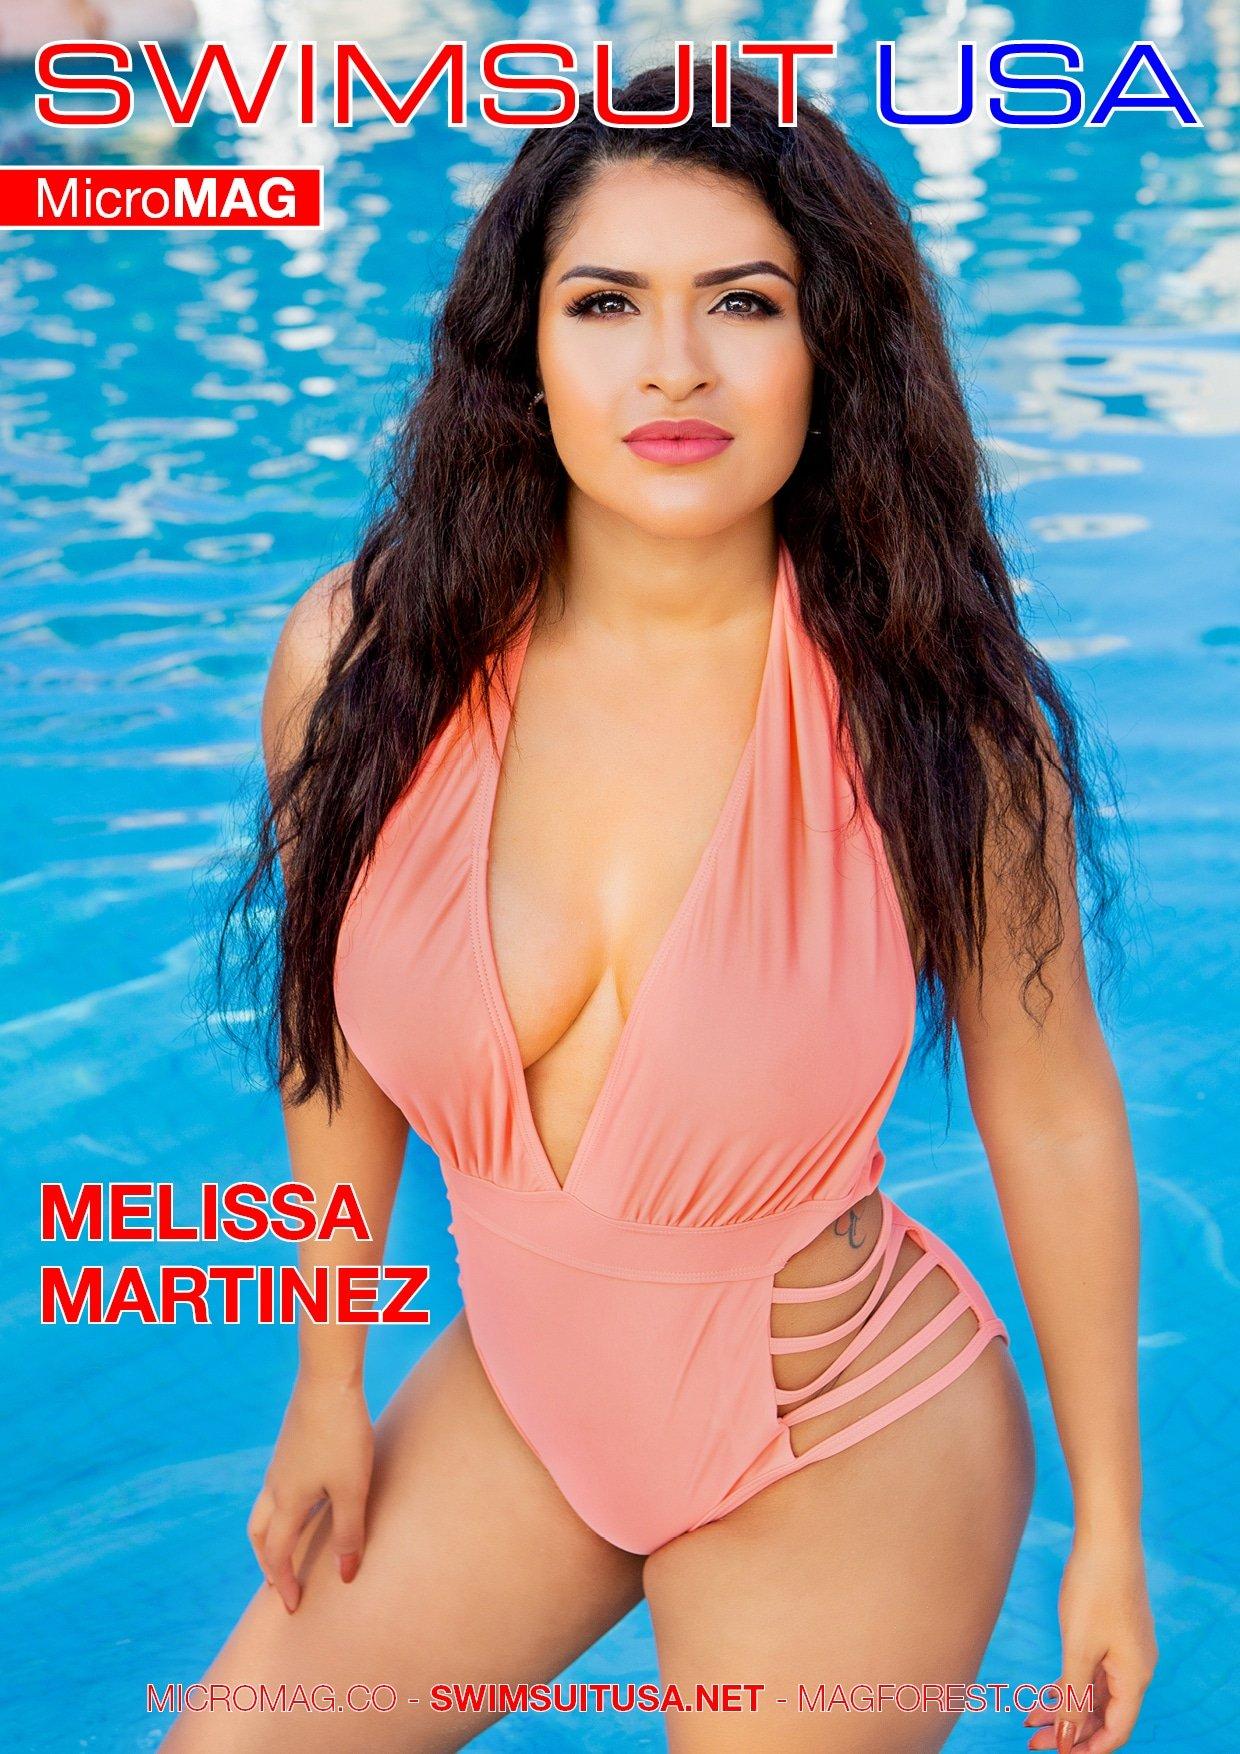 Swimsuit USA MicroMAG - Melissa Martinez